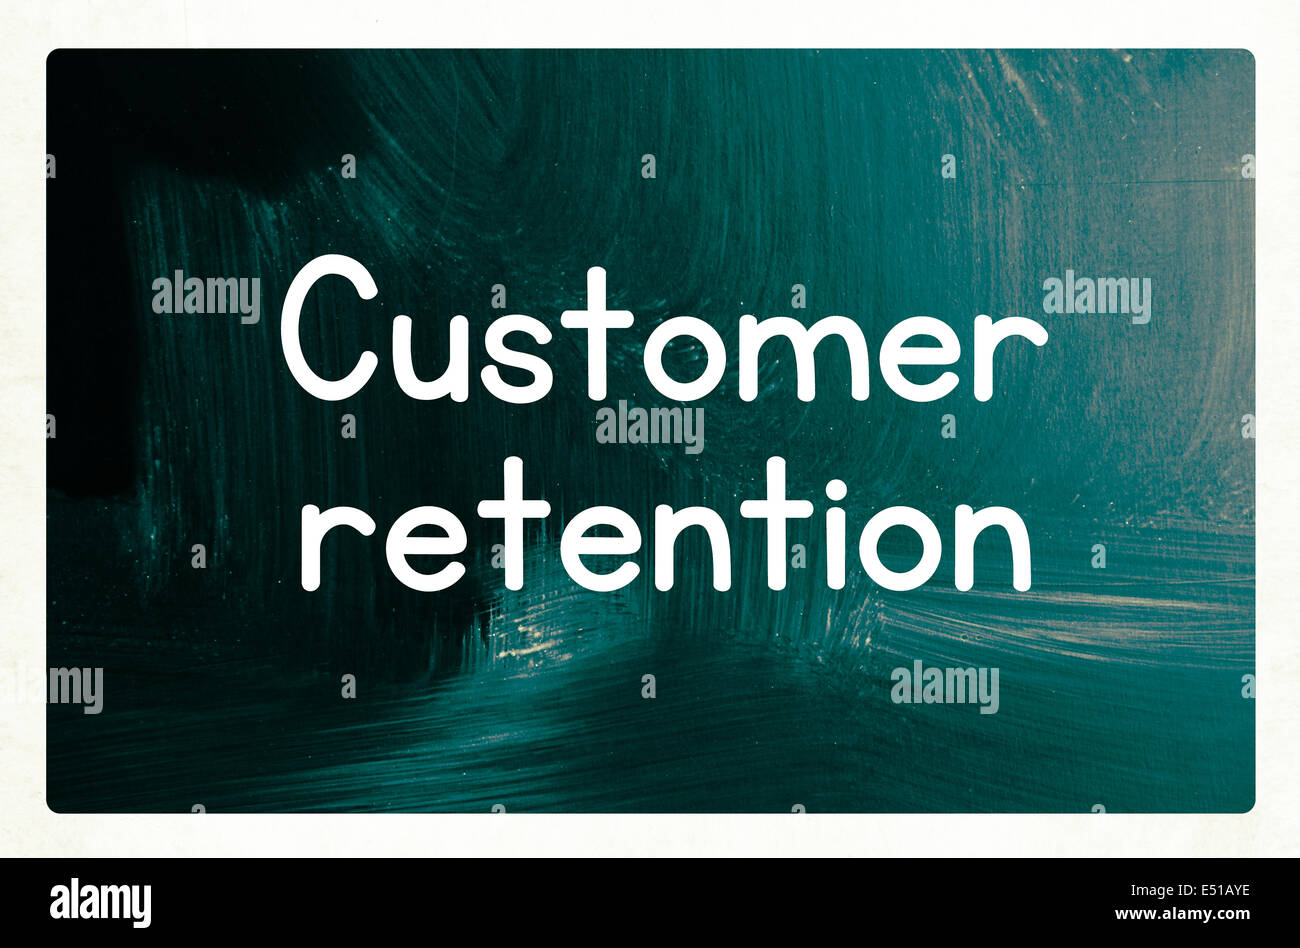 customer retention concept - Stock Image